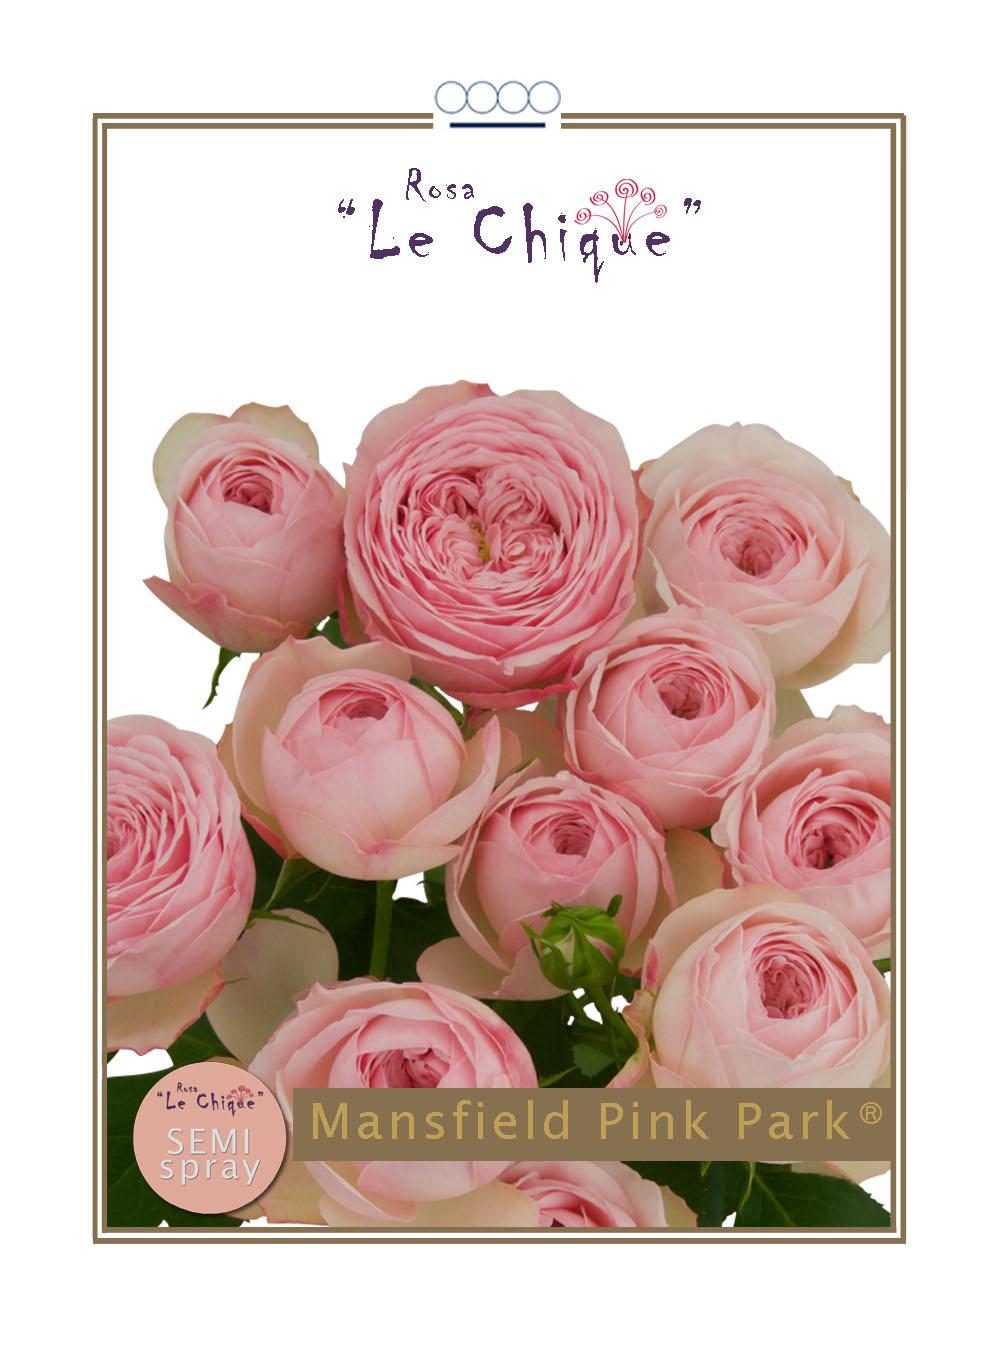 Mansfield Pink Park®